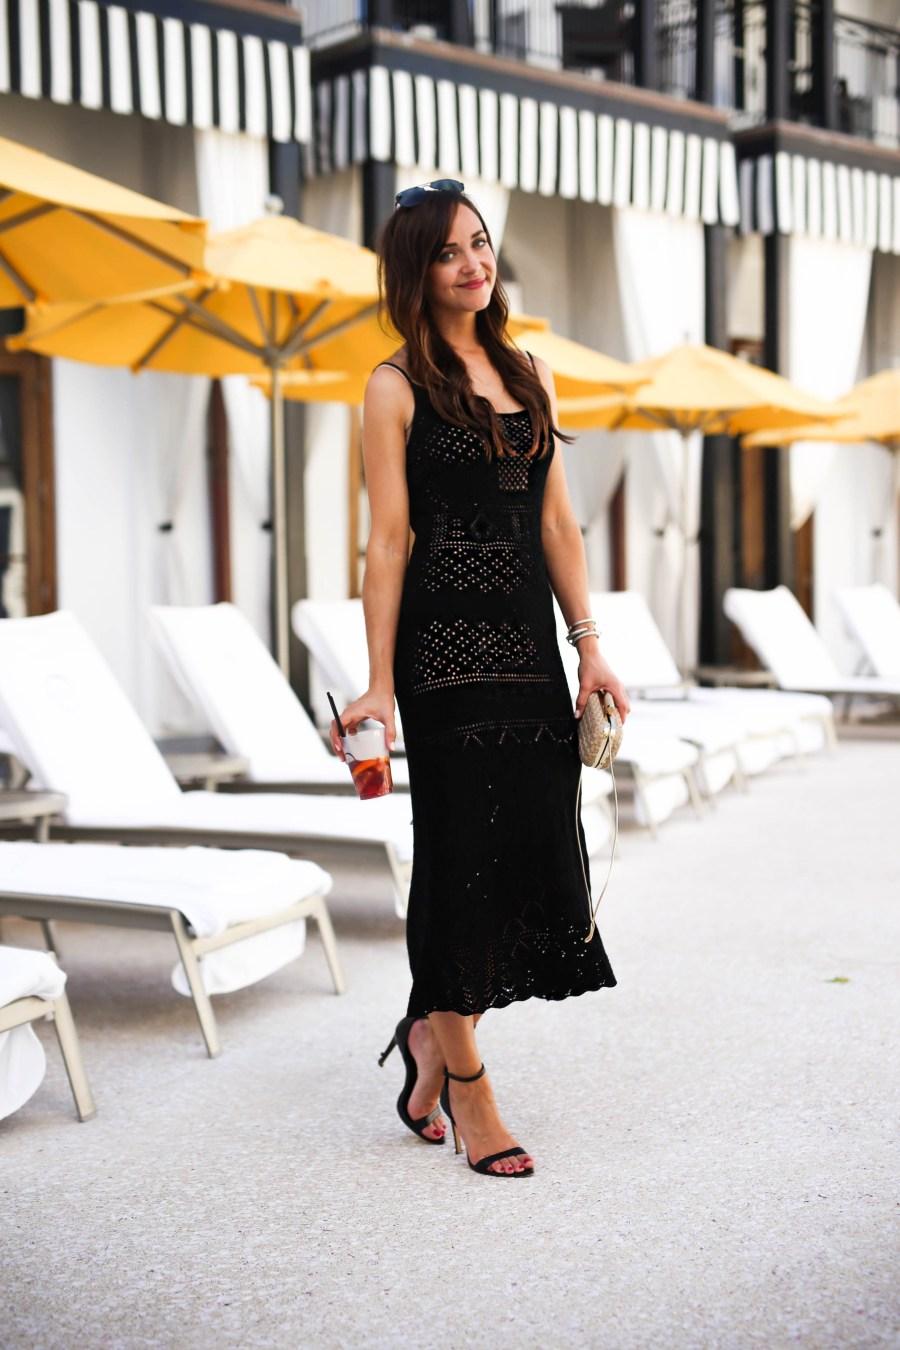 little black dress // rosemary beach // black and white hotel